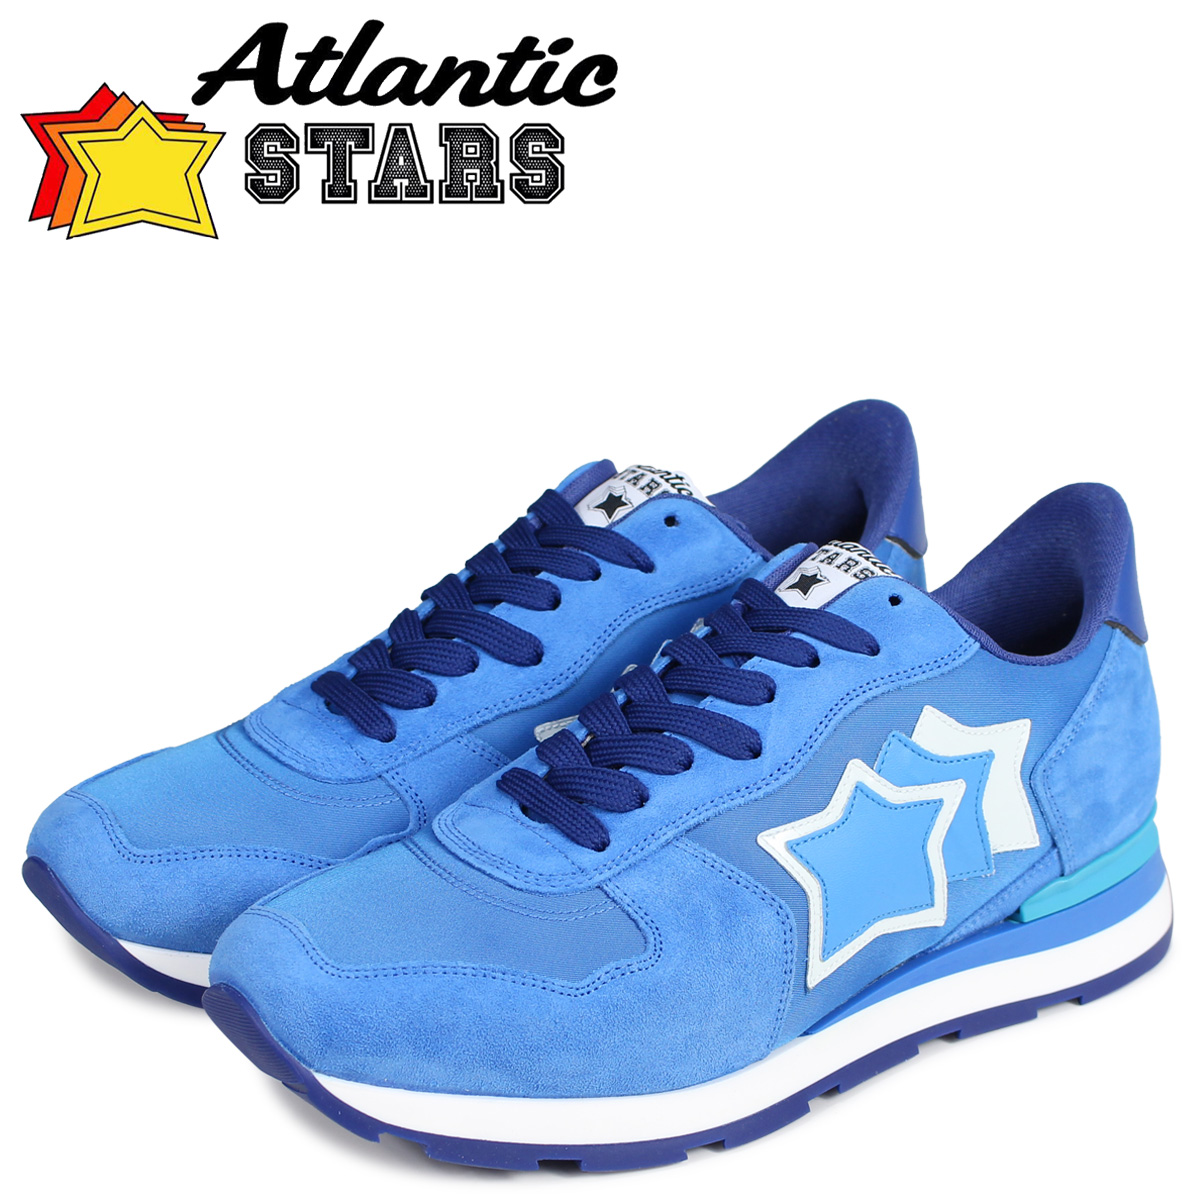 Atlantic STARS アトランティックスターズ アンタレス スニーカー メンズ ANTARES ブルー DBA-18C [4/3 新入荷]